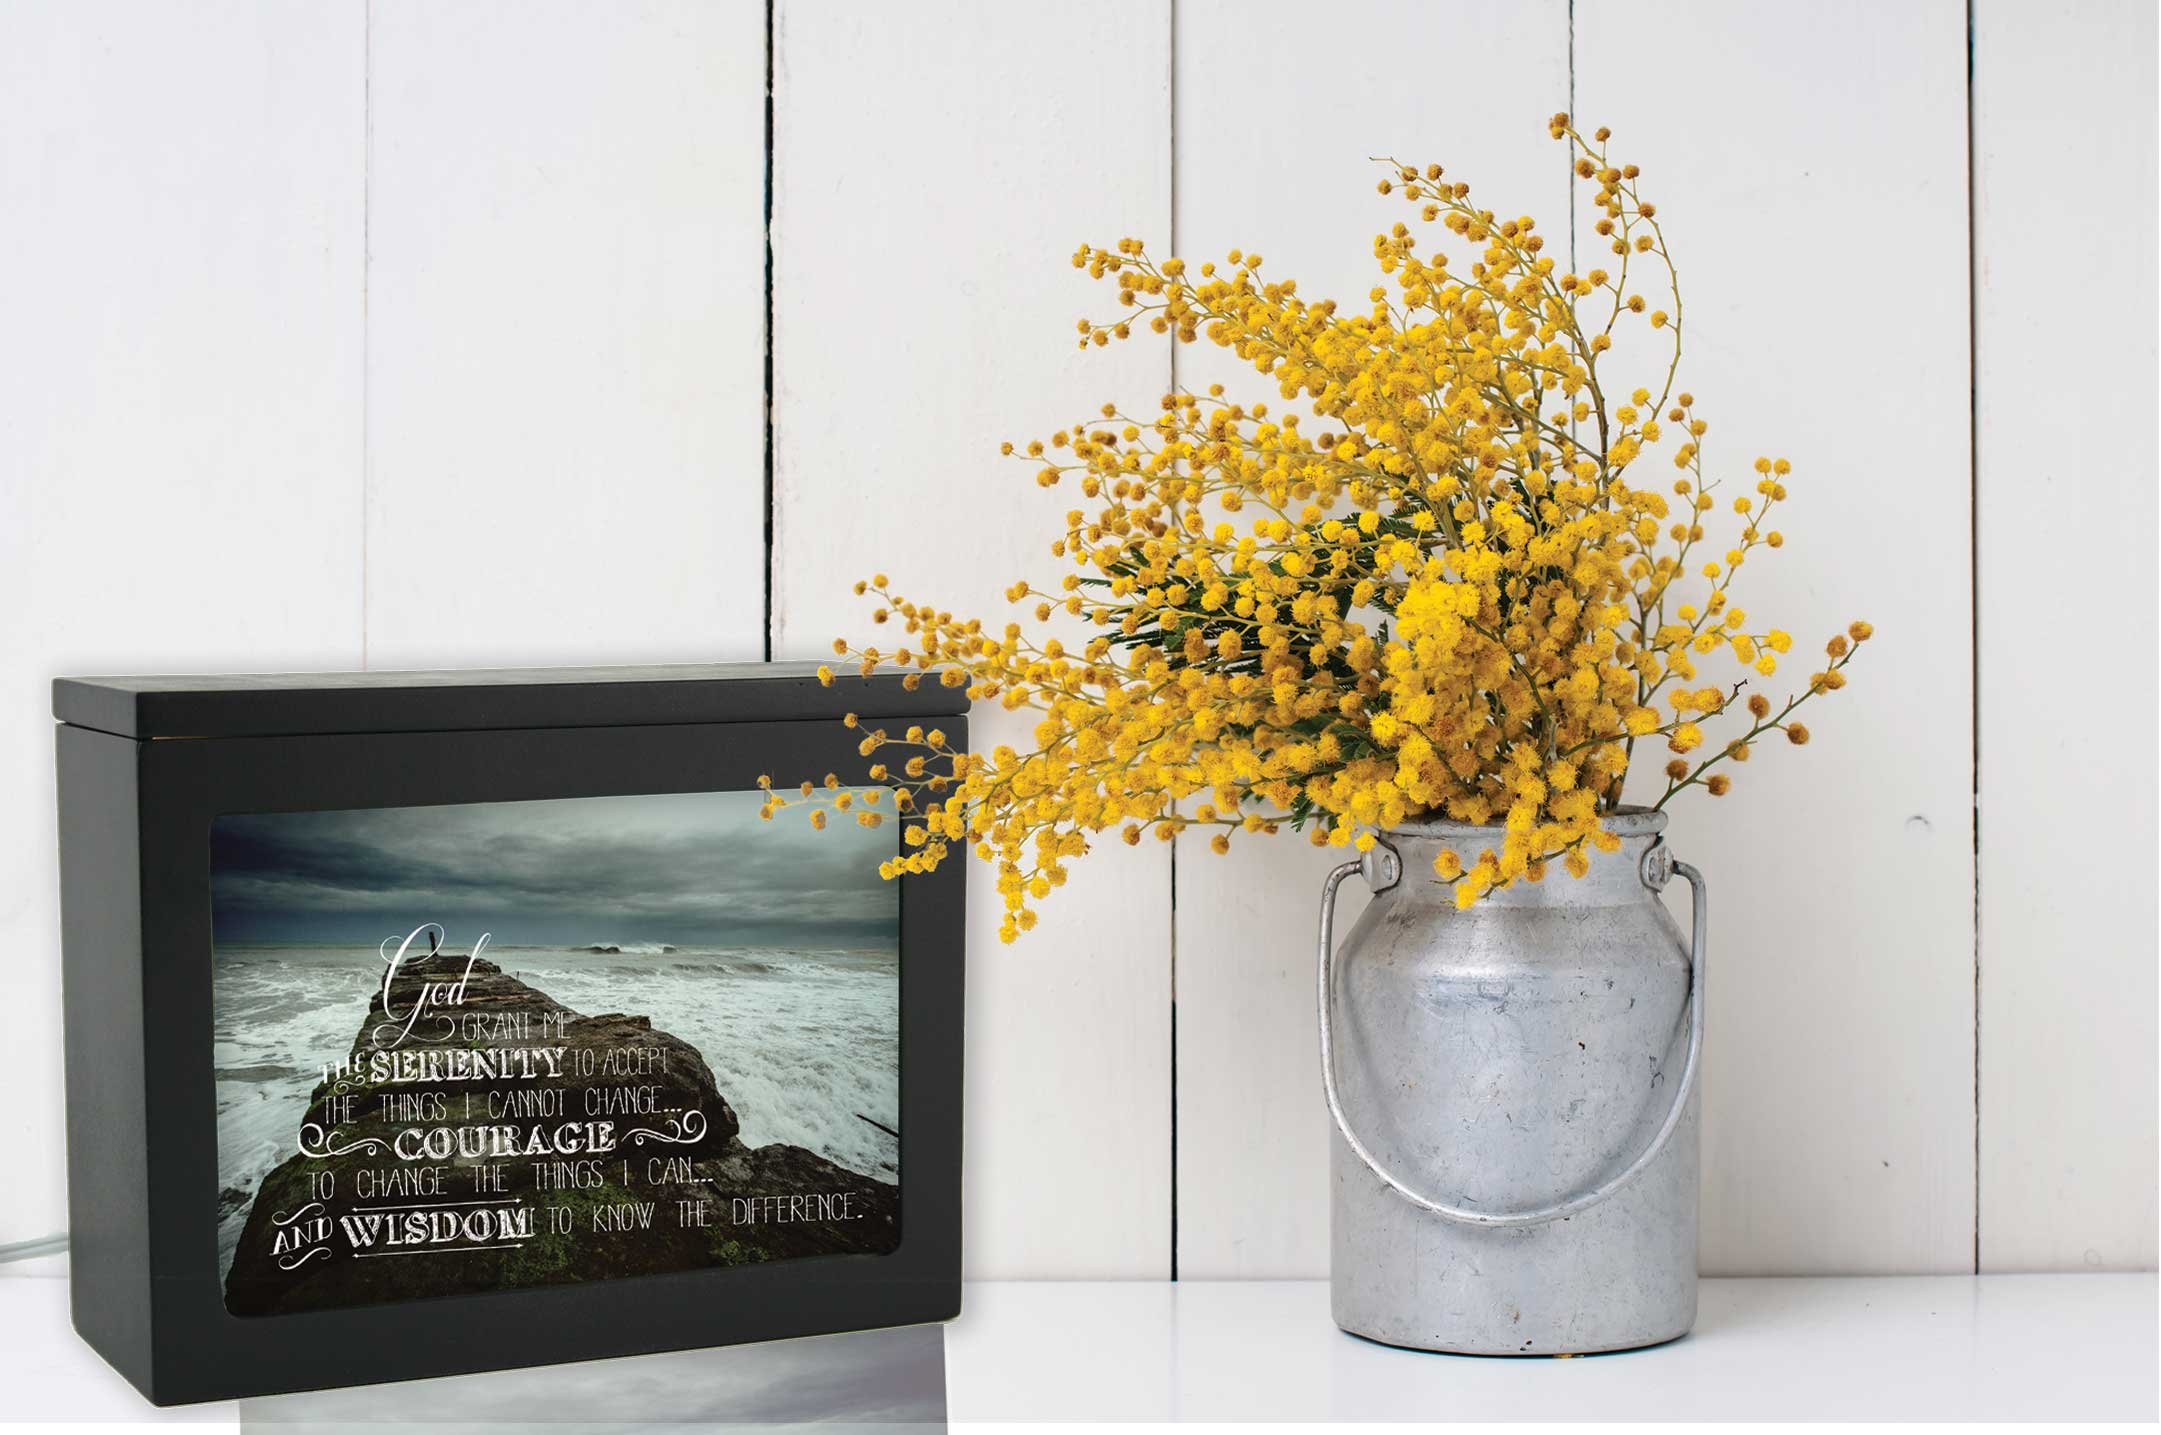 Jada Venia 4-211 - 7'' x 5'' Serenity Prayer Photo Light Box Insert